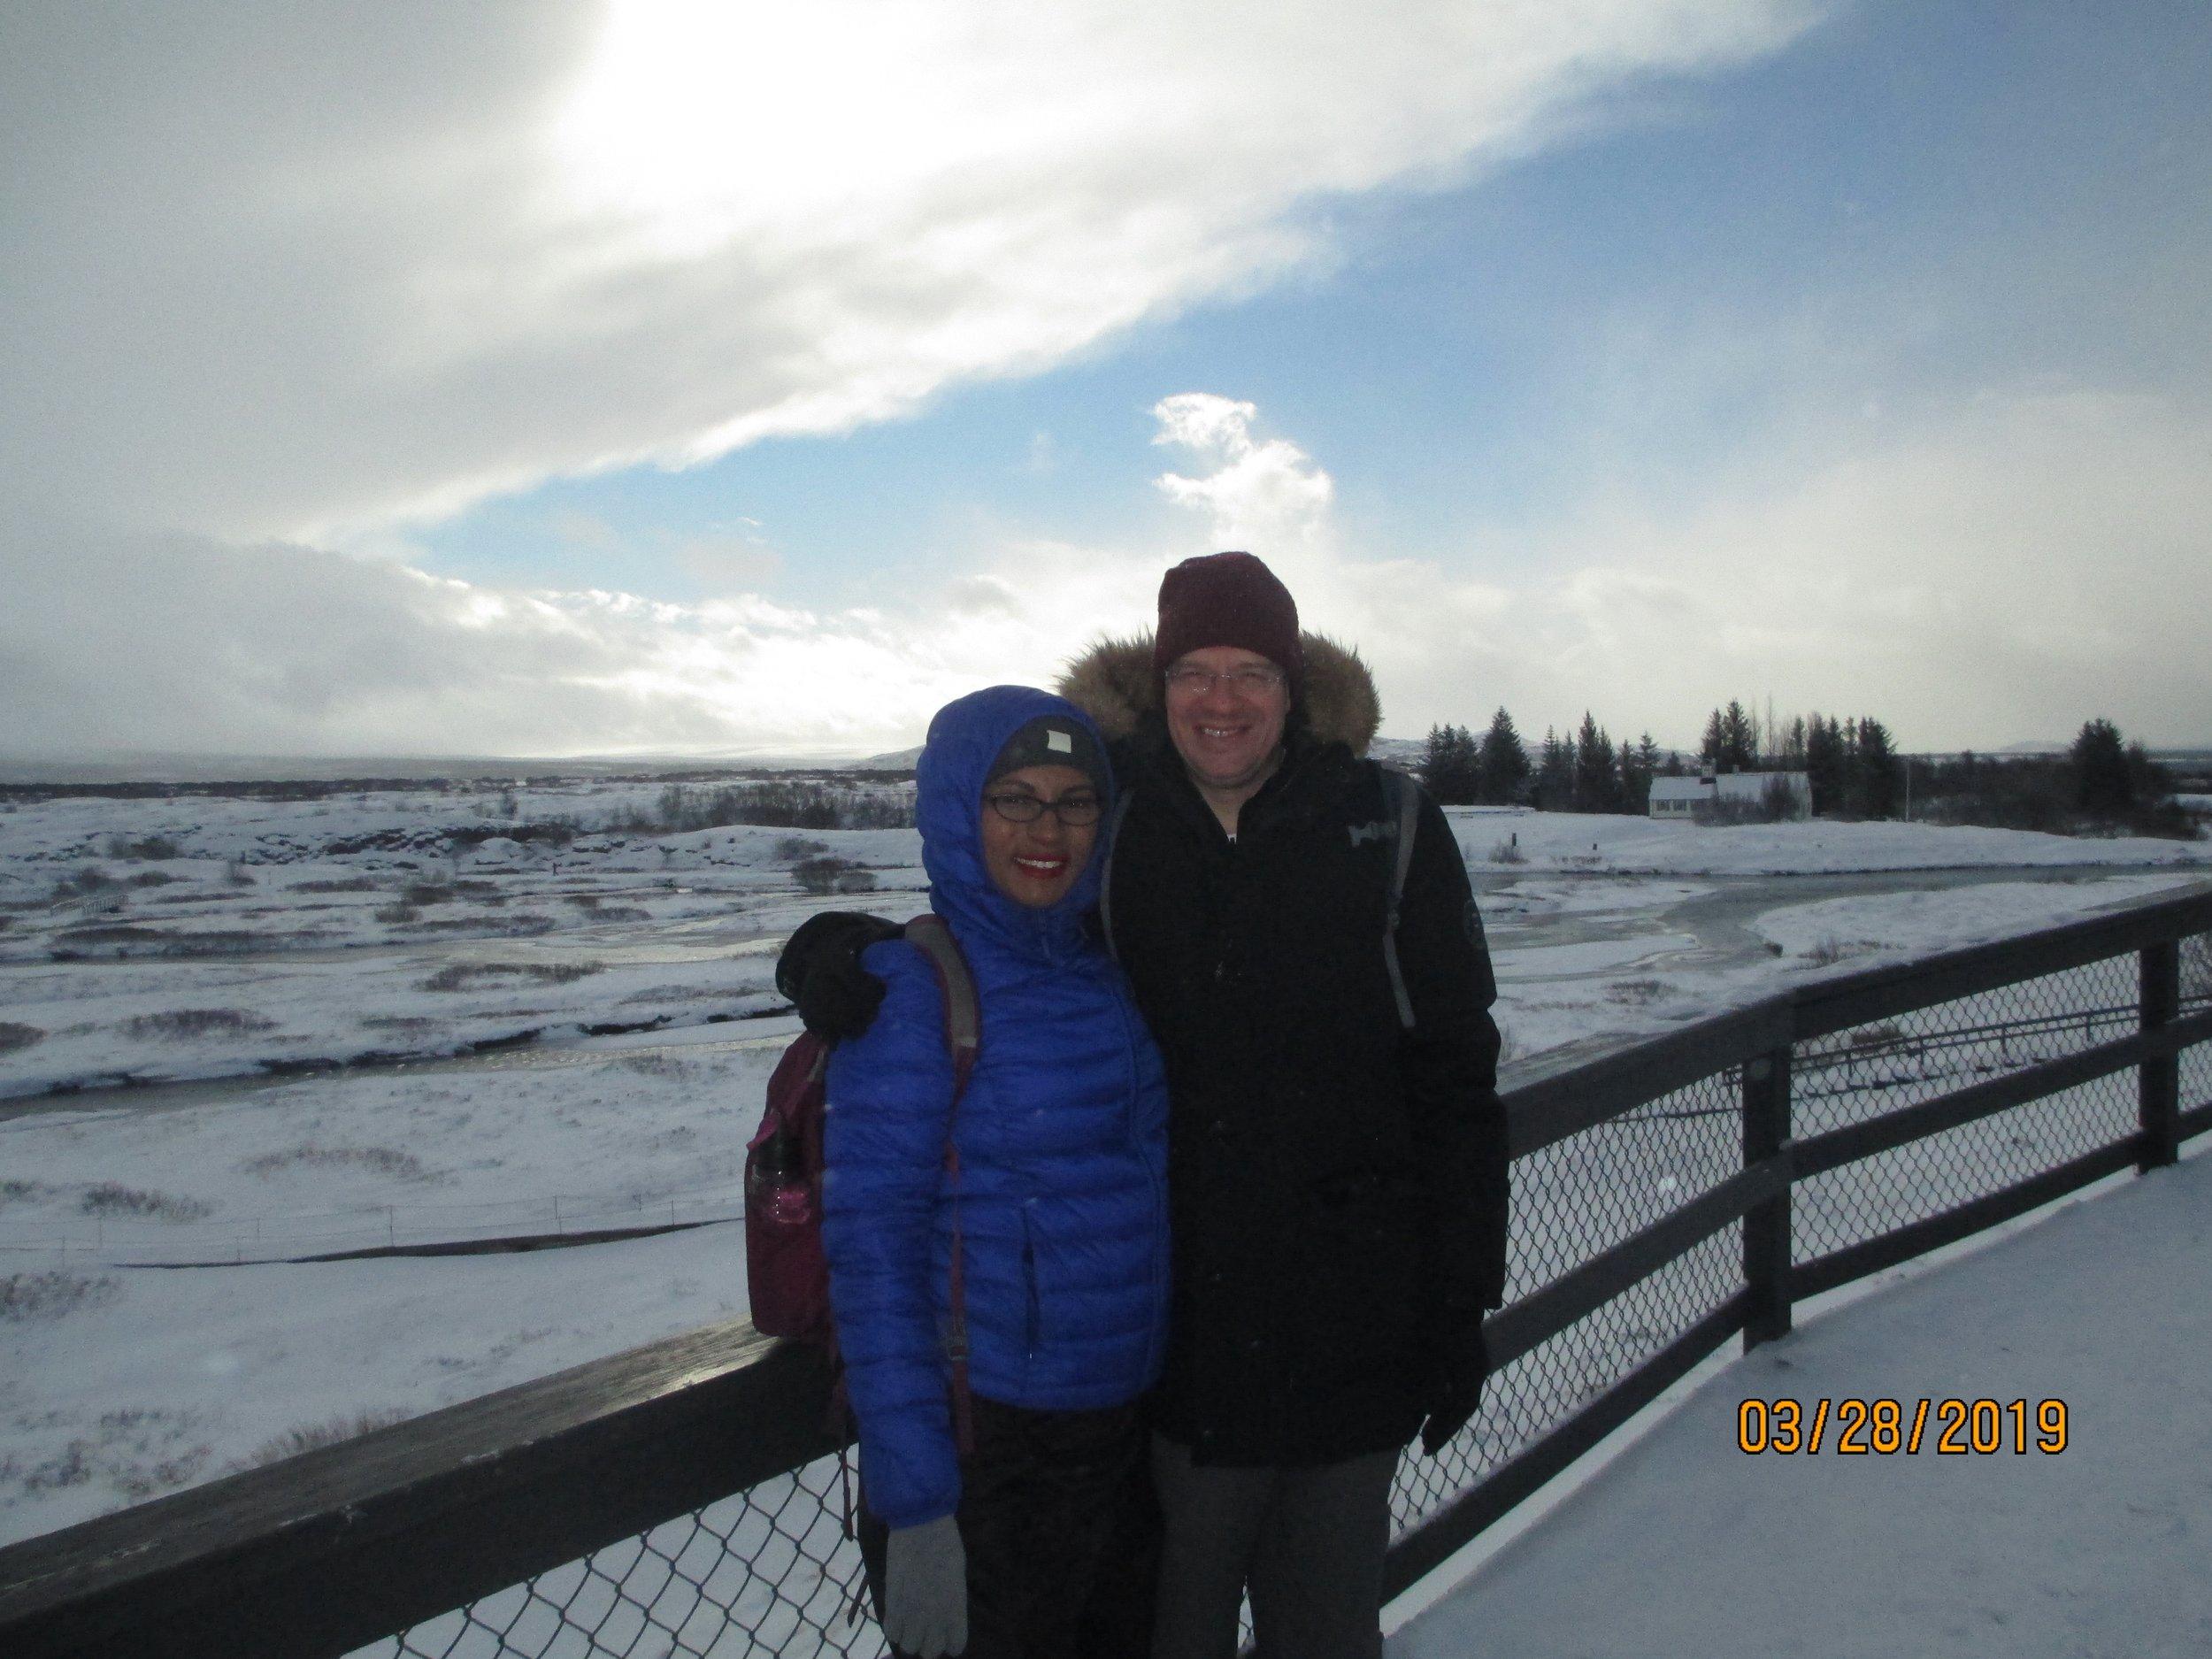 Exploring Iceland, a winter wonderland